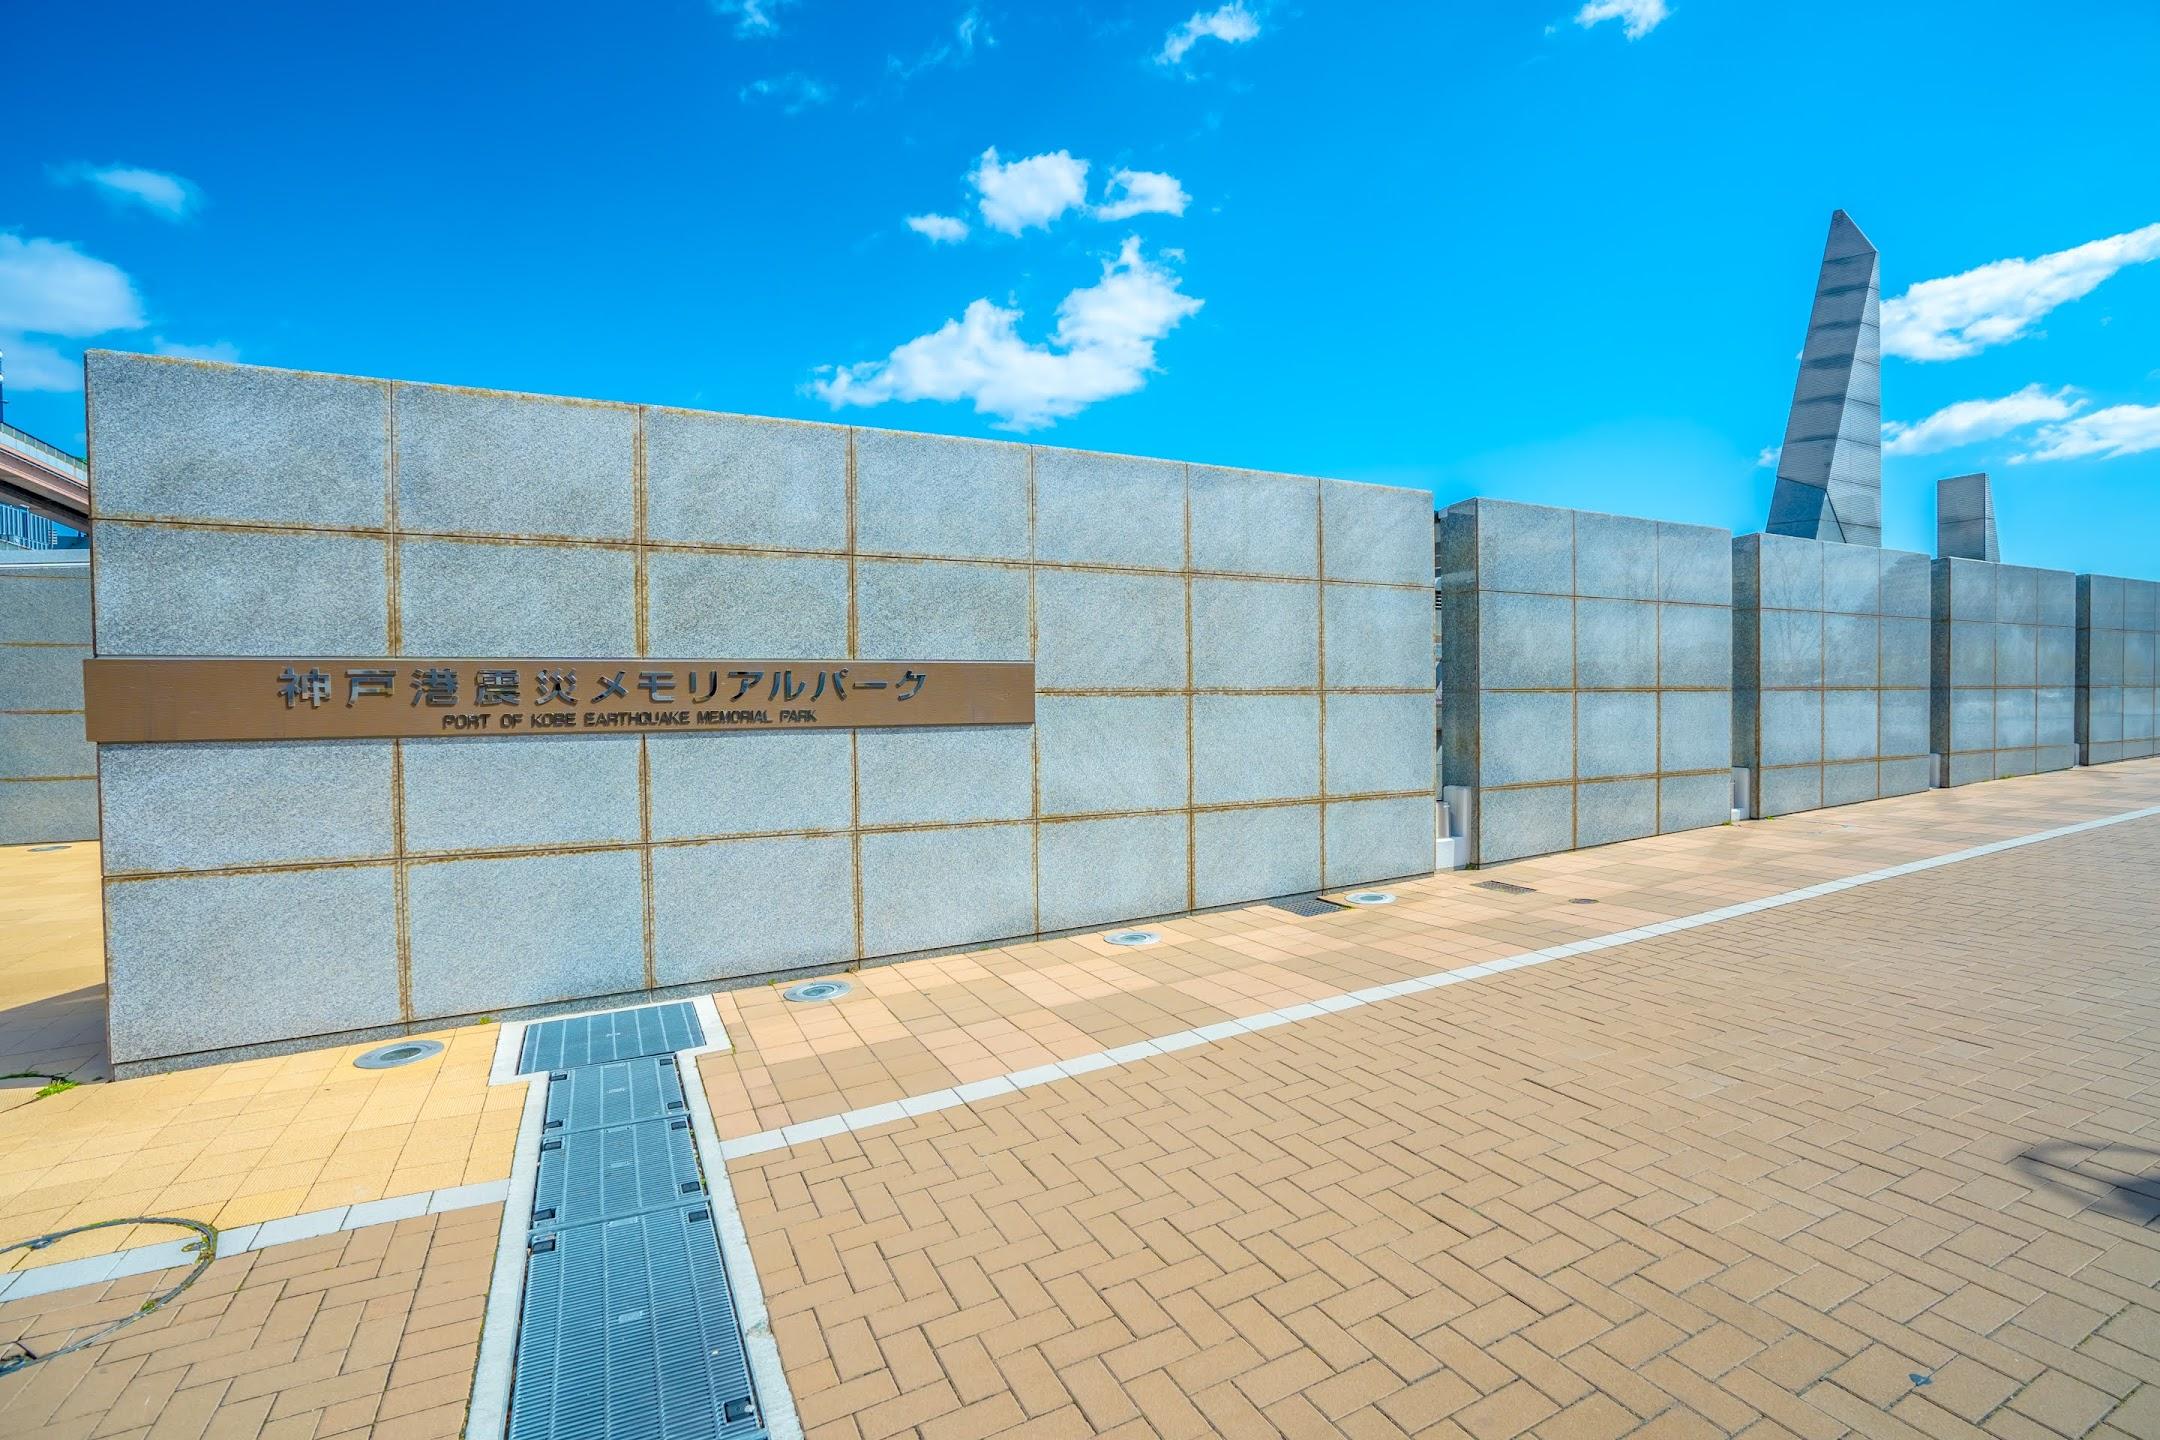 Port of Kobe Earthquake Memorial Park